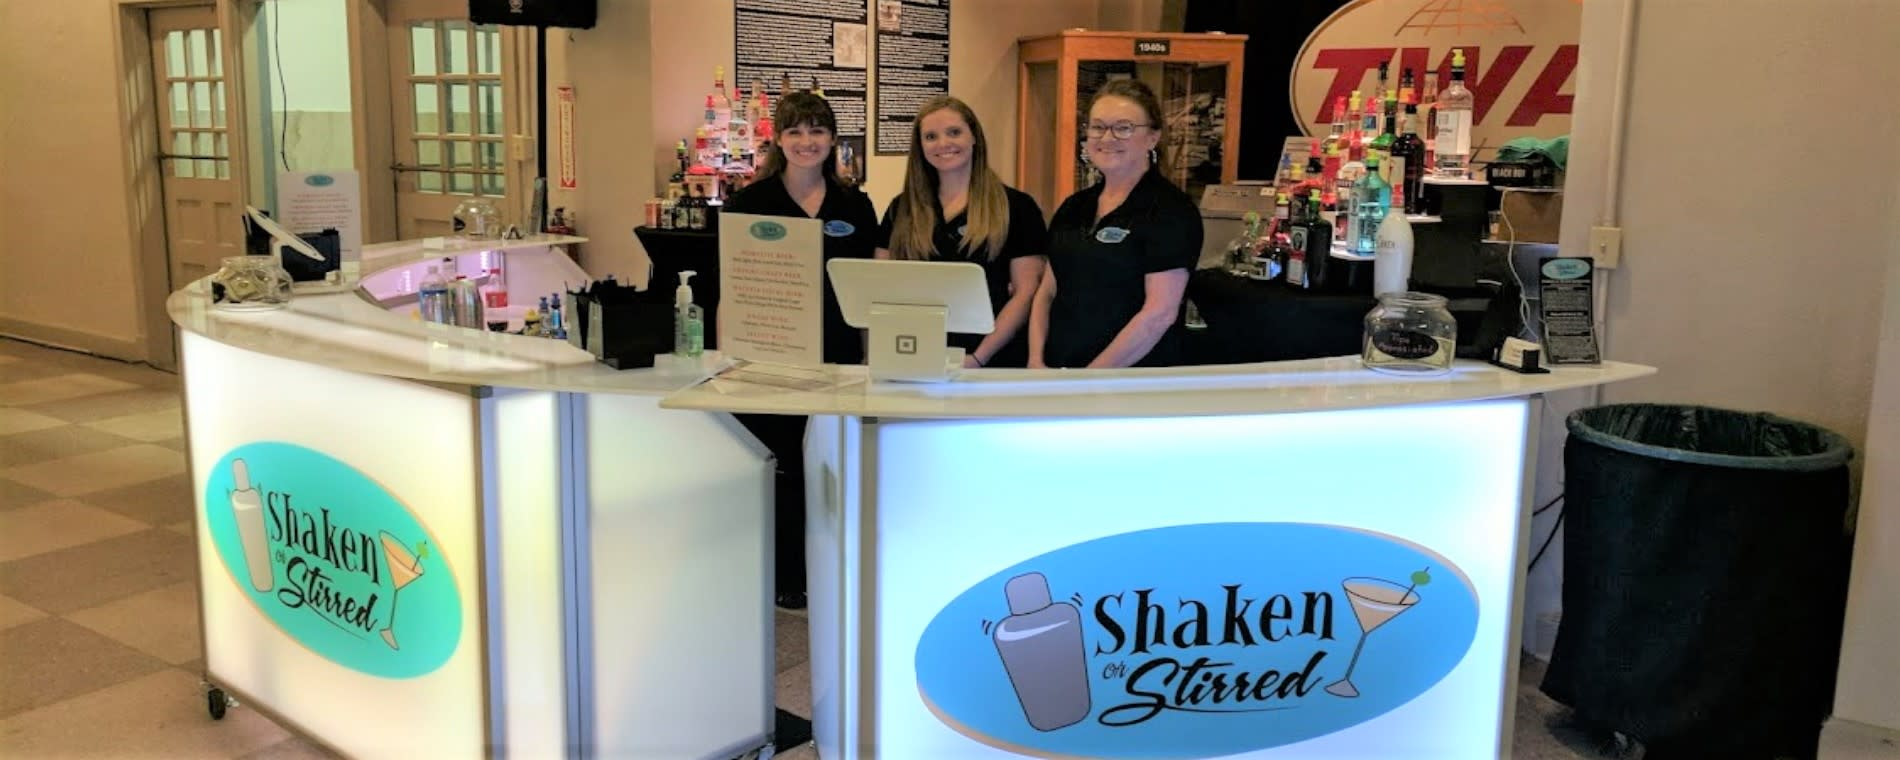 Shaken or Stirred at event Visit Wichita